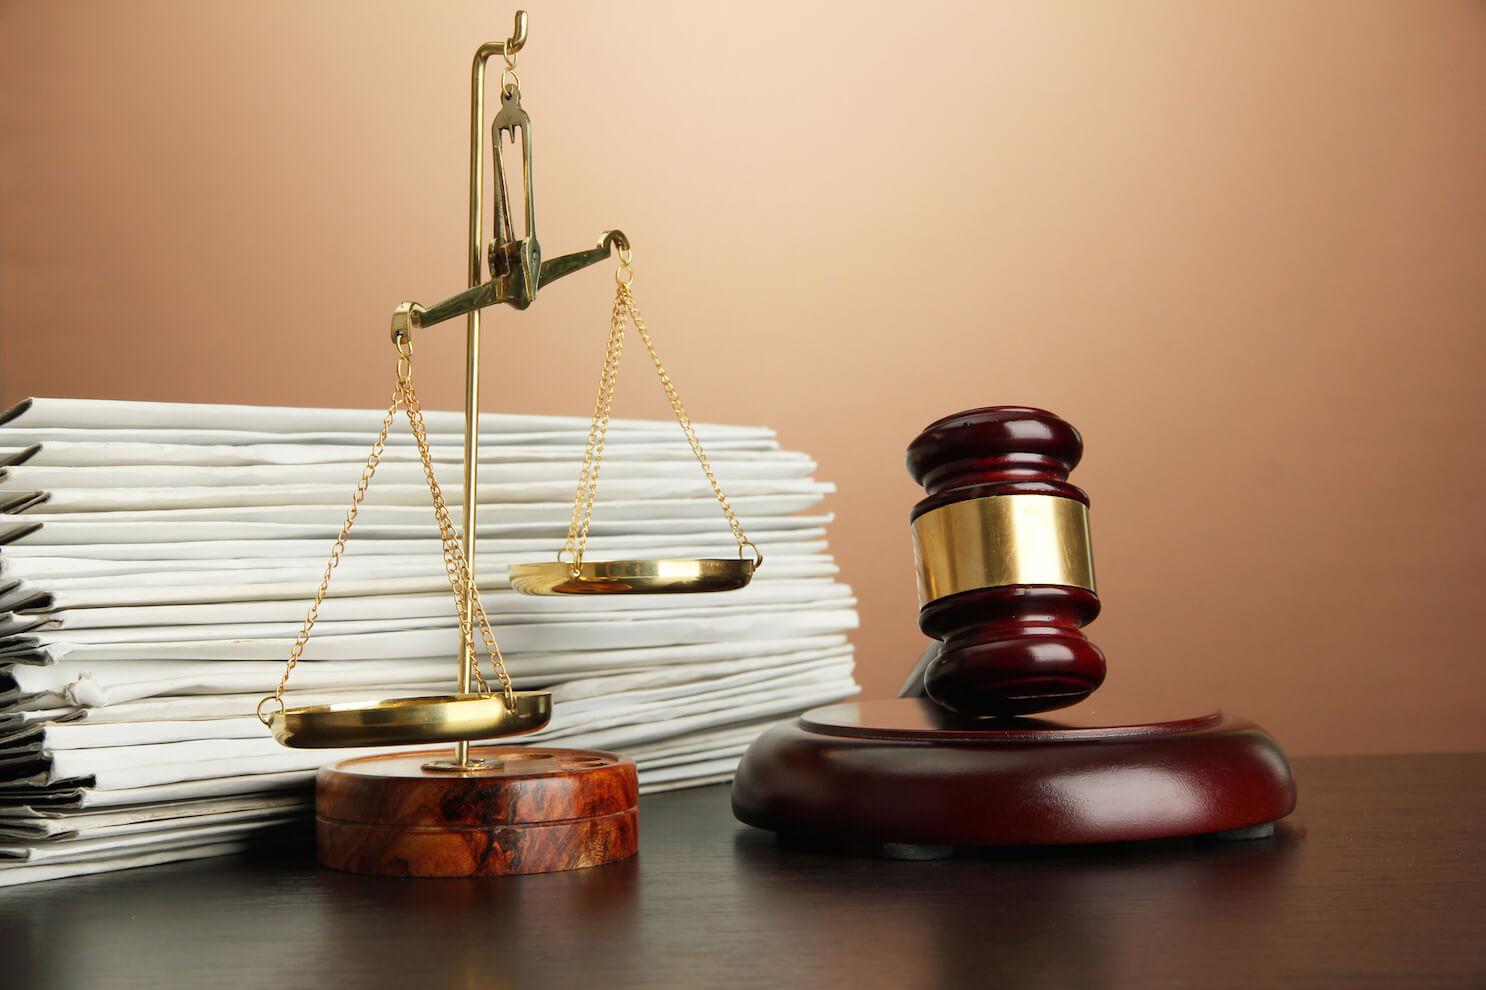 scales-of-justice-gavel-credit-te-belchonock-depositphotos